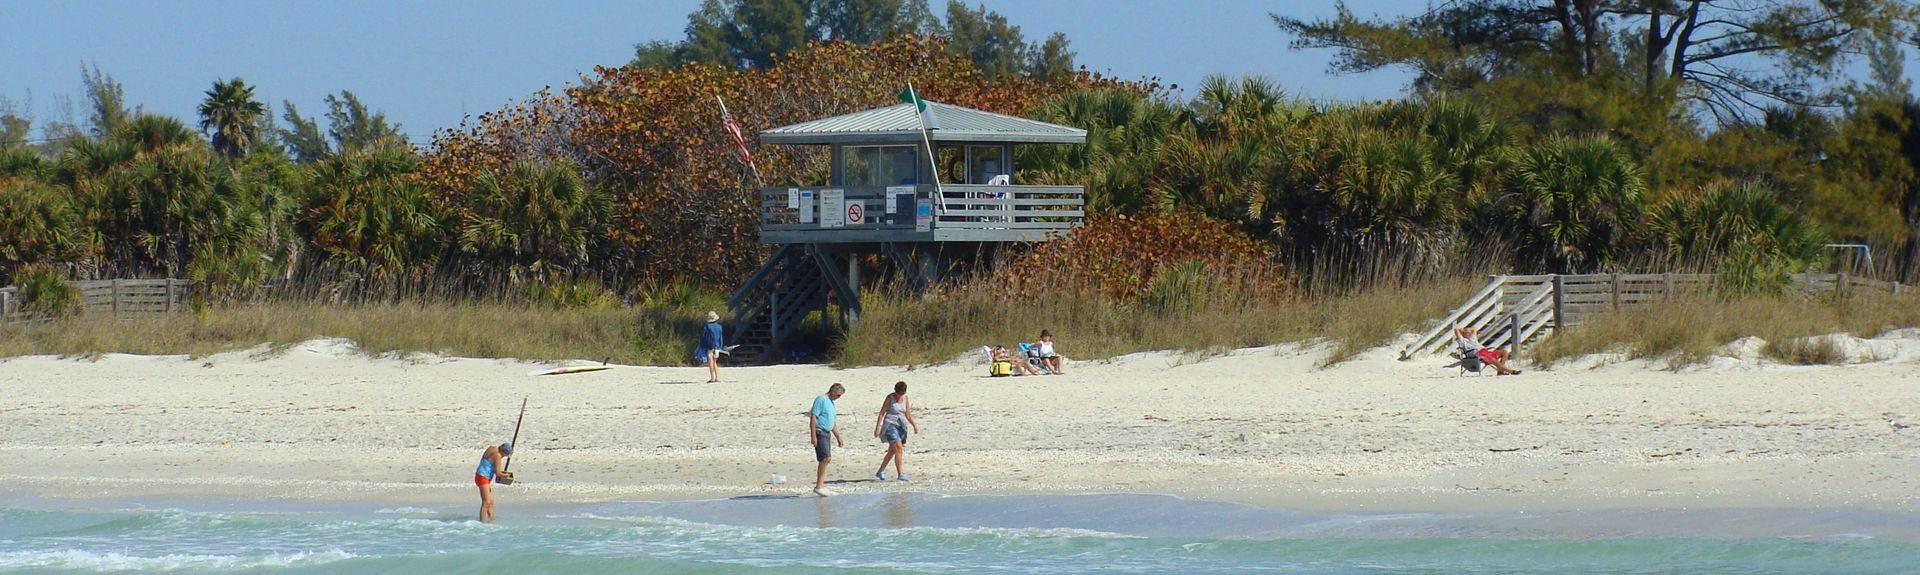 Nokomis Beach, Nokomis, Florida, USA